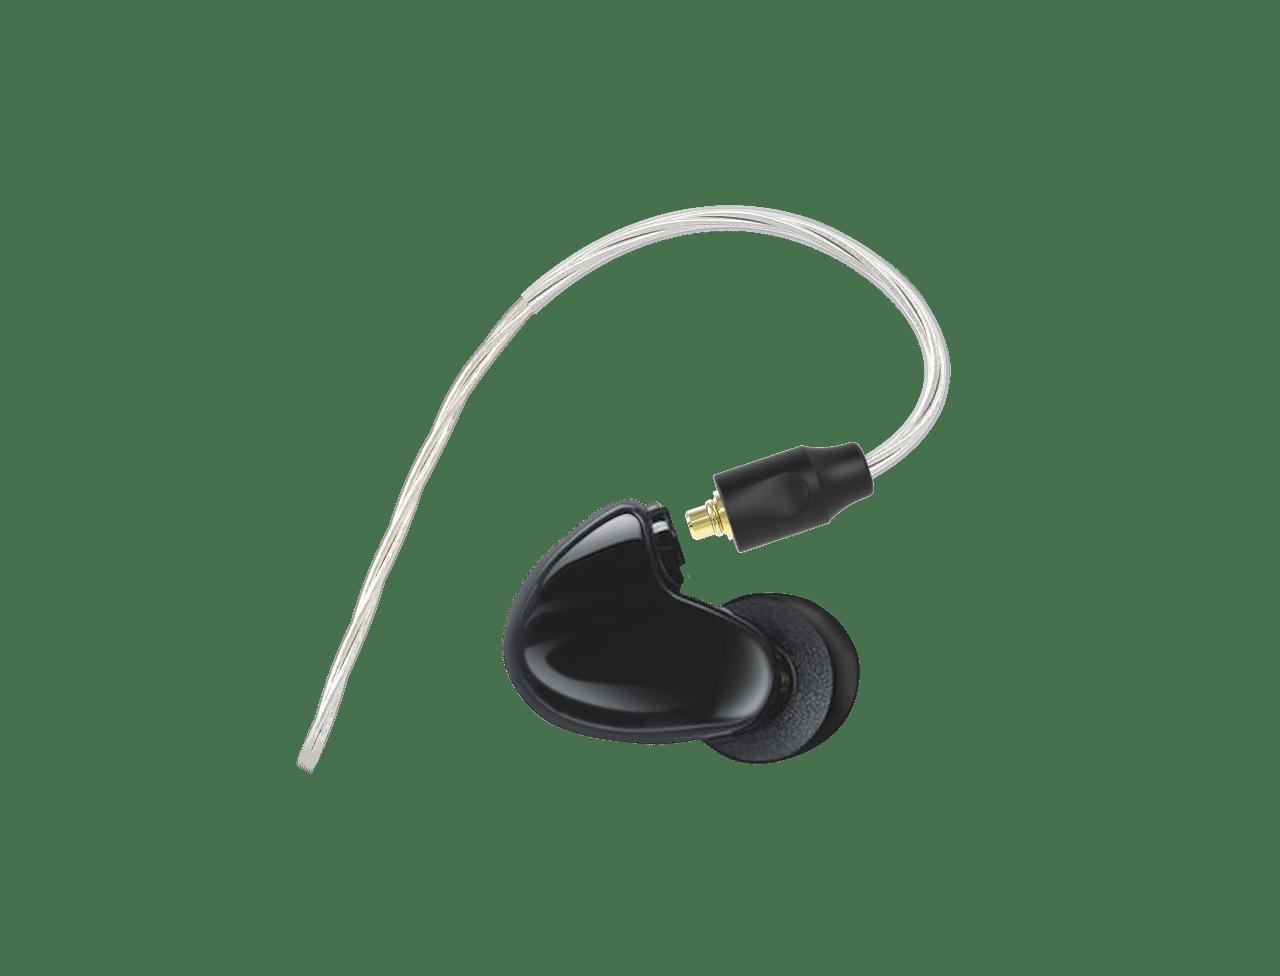 ProStereo 全新產品:ProStereo L5立體聲藍牙耳機線定價 $699 - TechApple.com